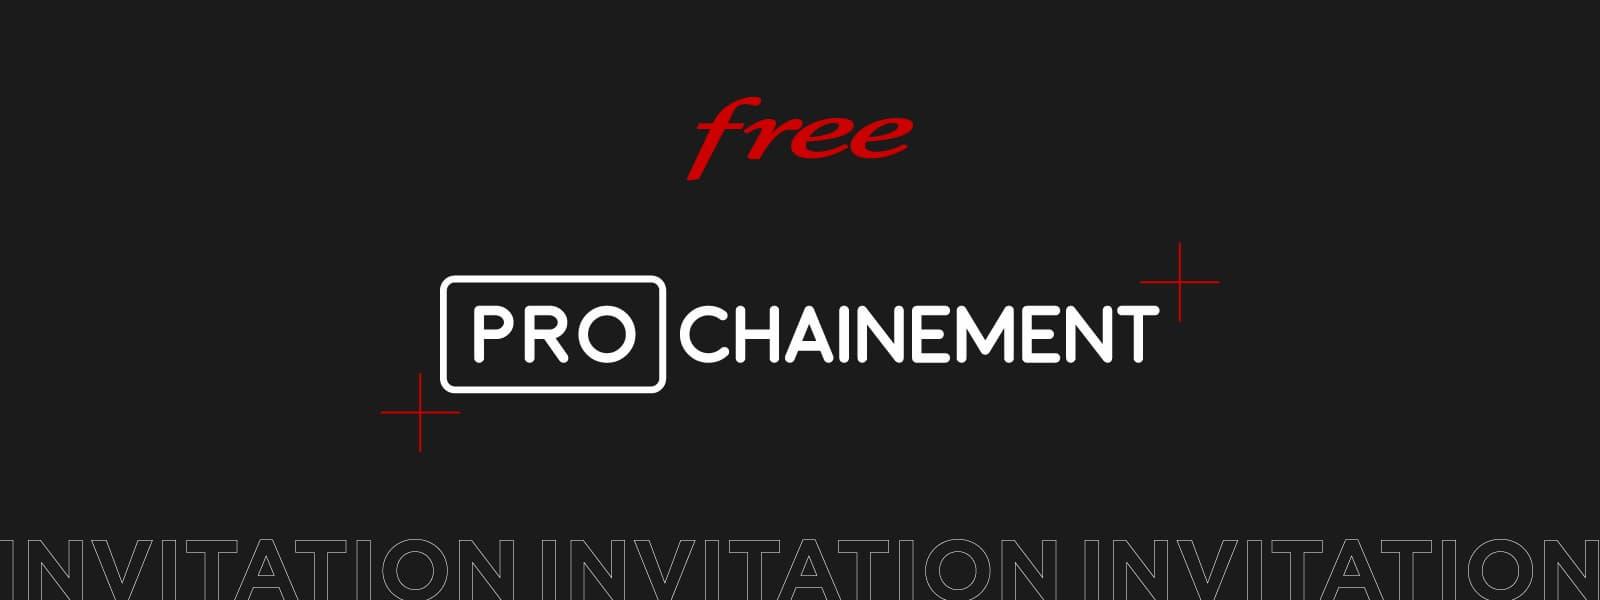 Free PRO